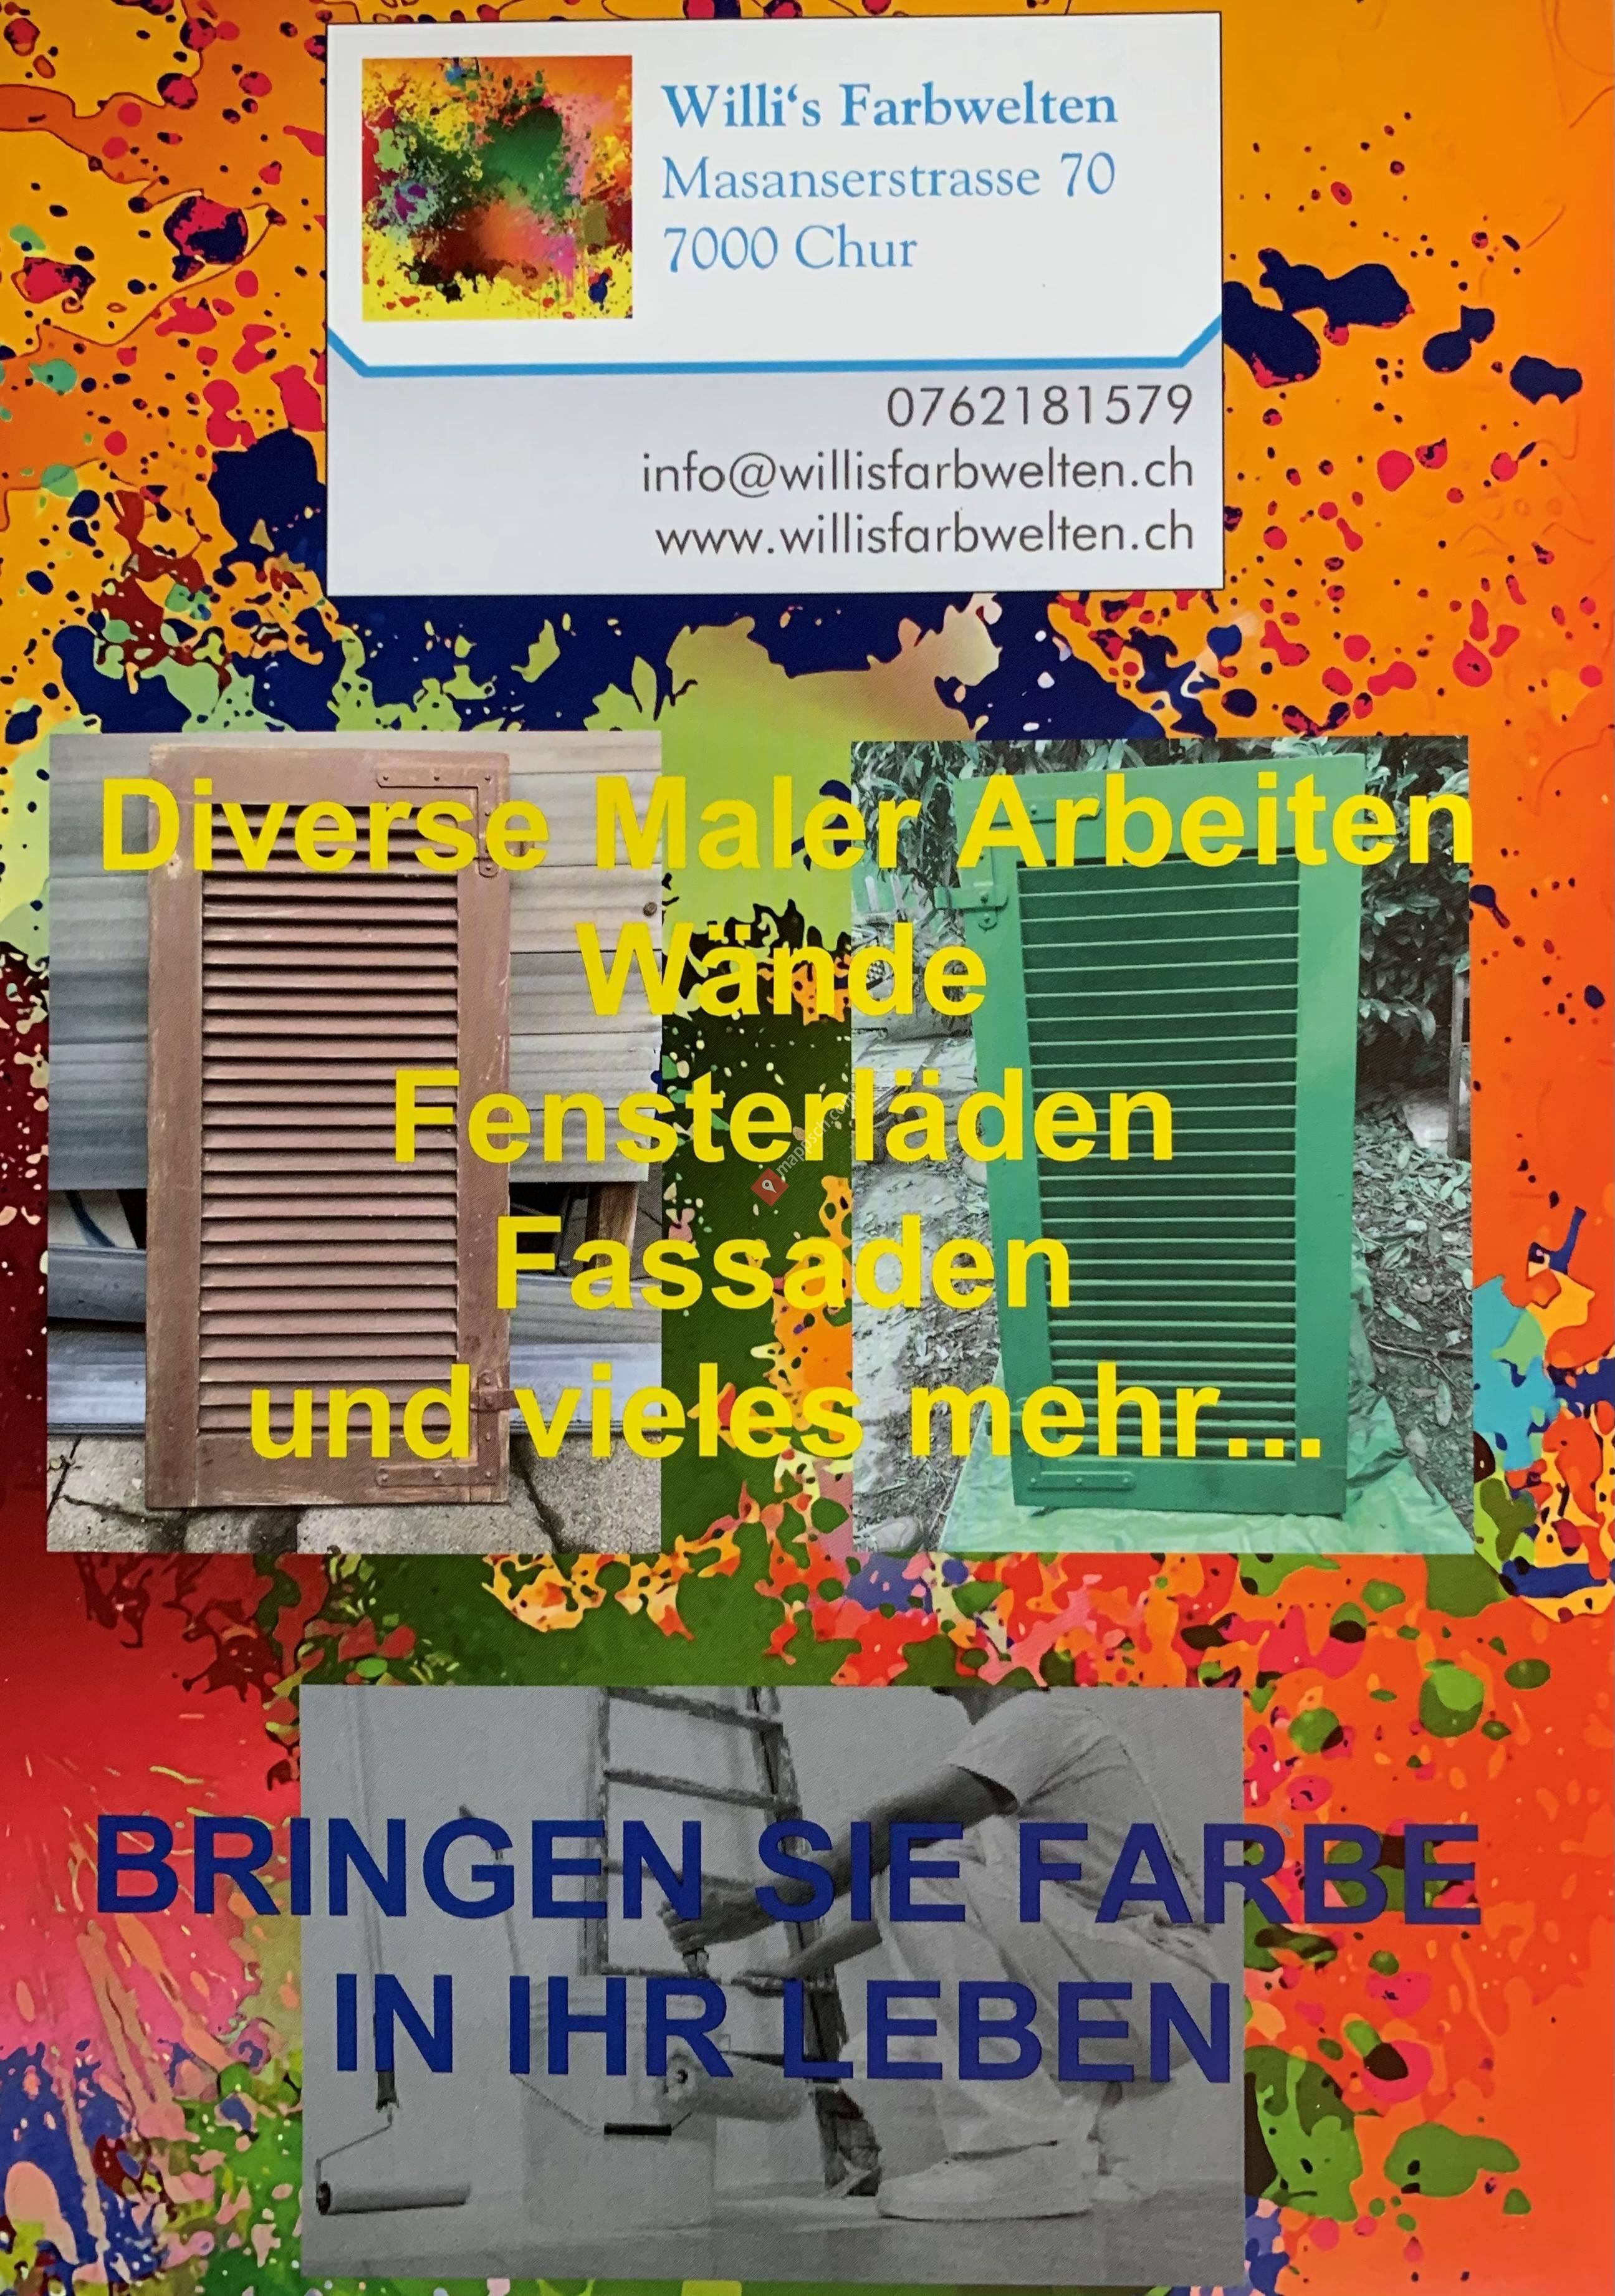 Willis Farbwelten